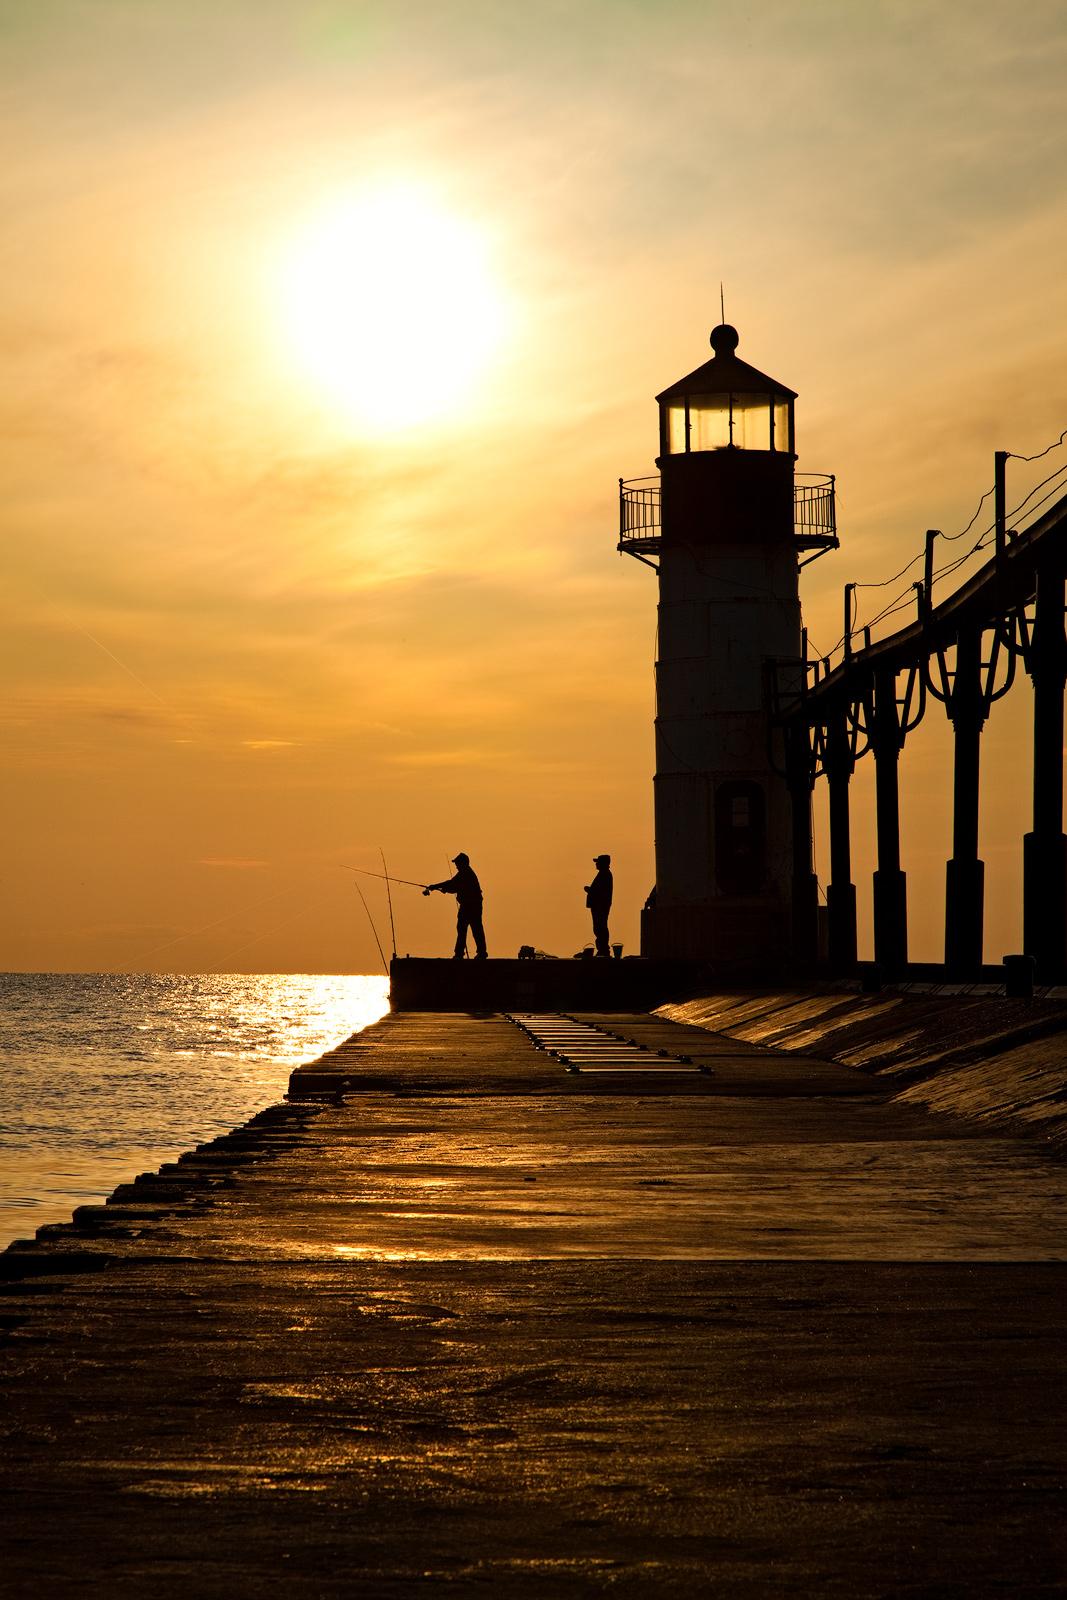 america,beautiful,building,fisherman,fishing,lighthouse,michigan,midwest,north america,saint joseph,silhouette,st. joseph,sunset,united states,us,usa,vertical, photo